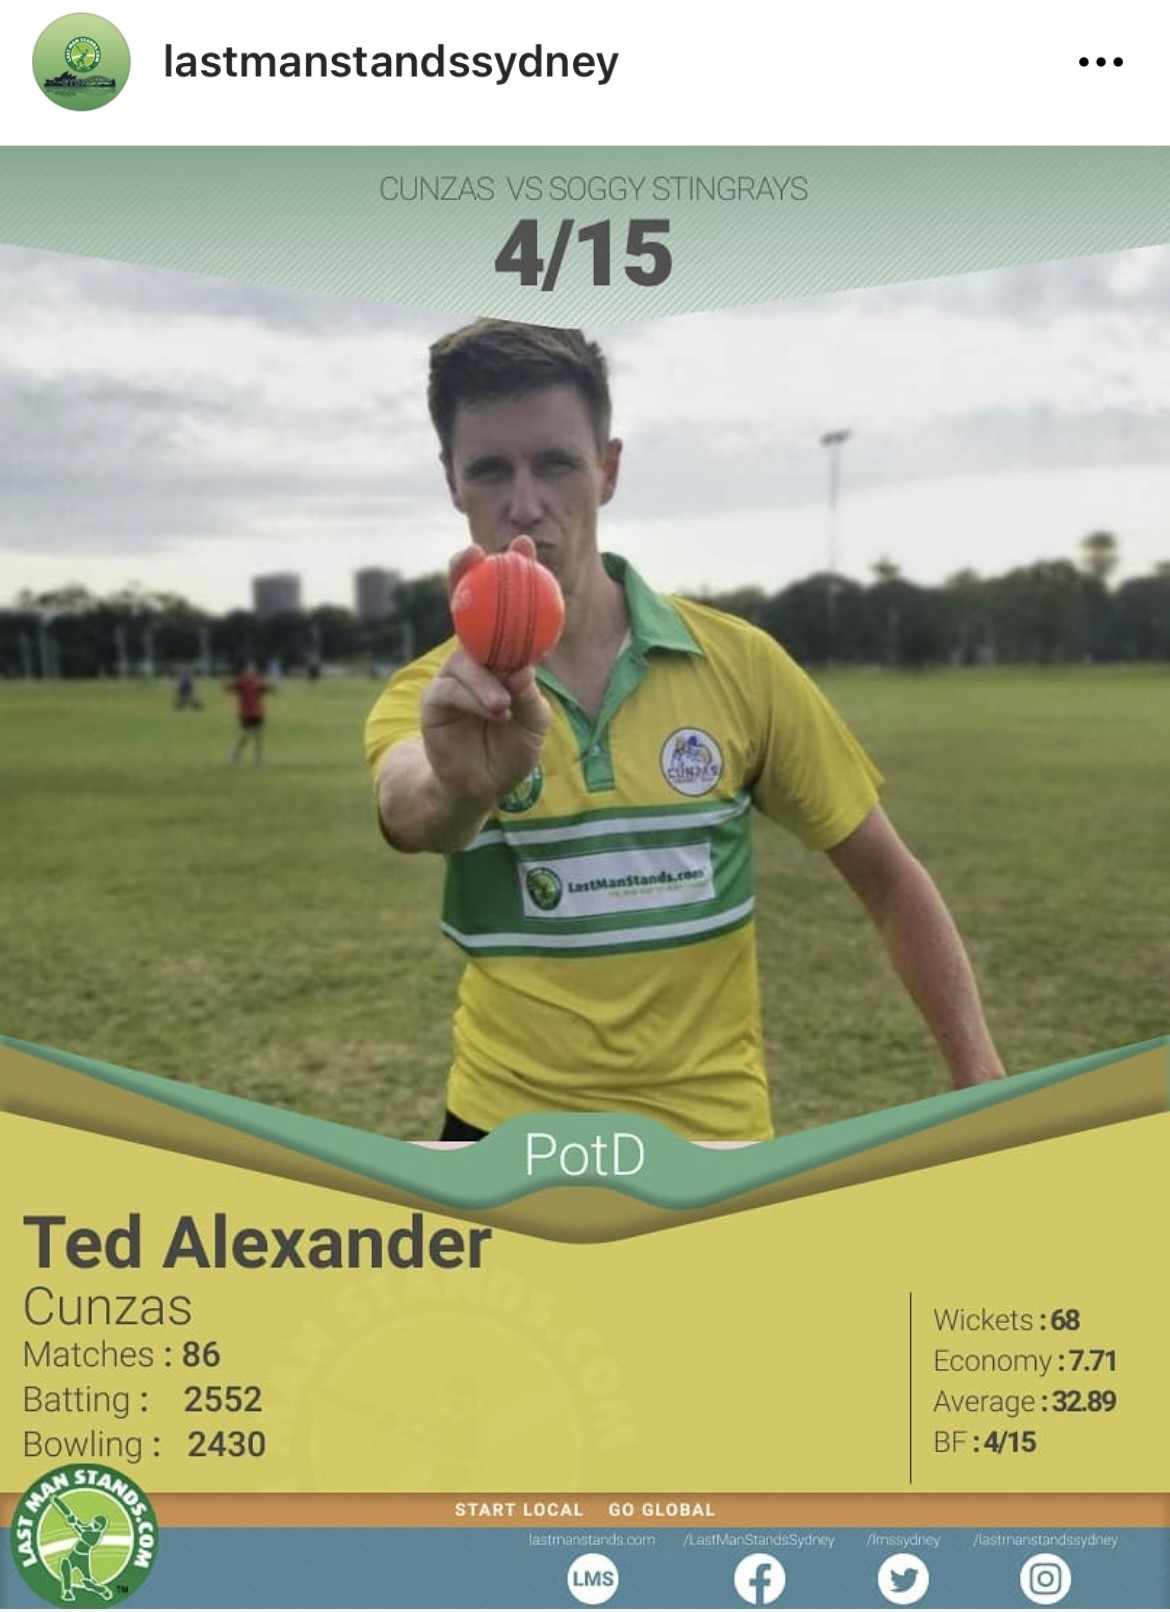 Ted Alexander